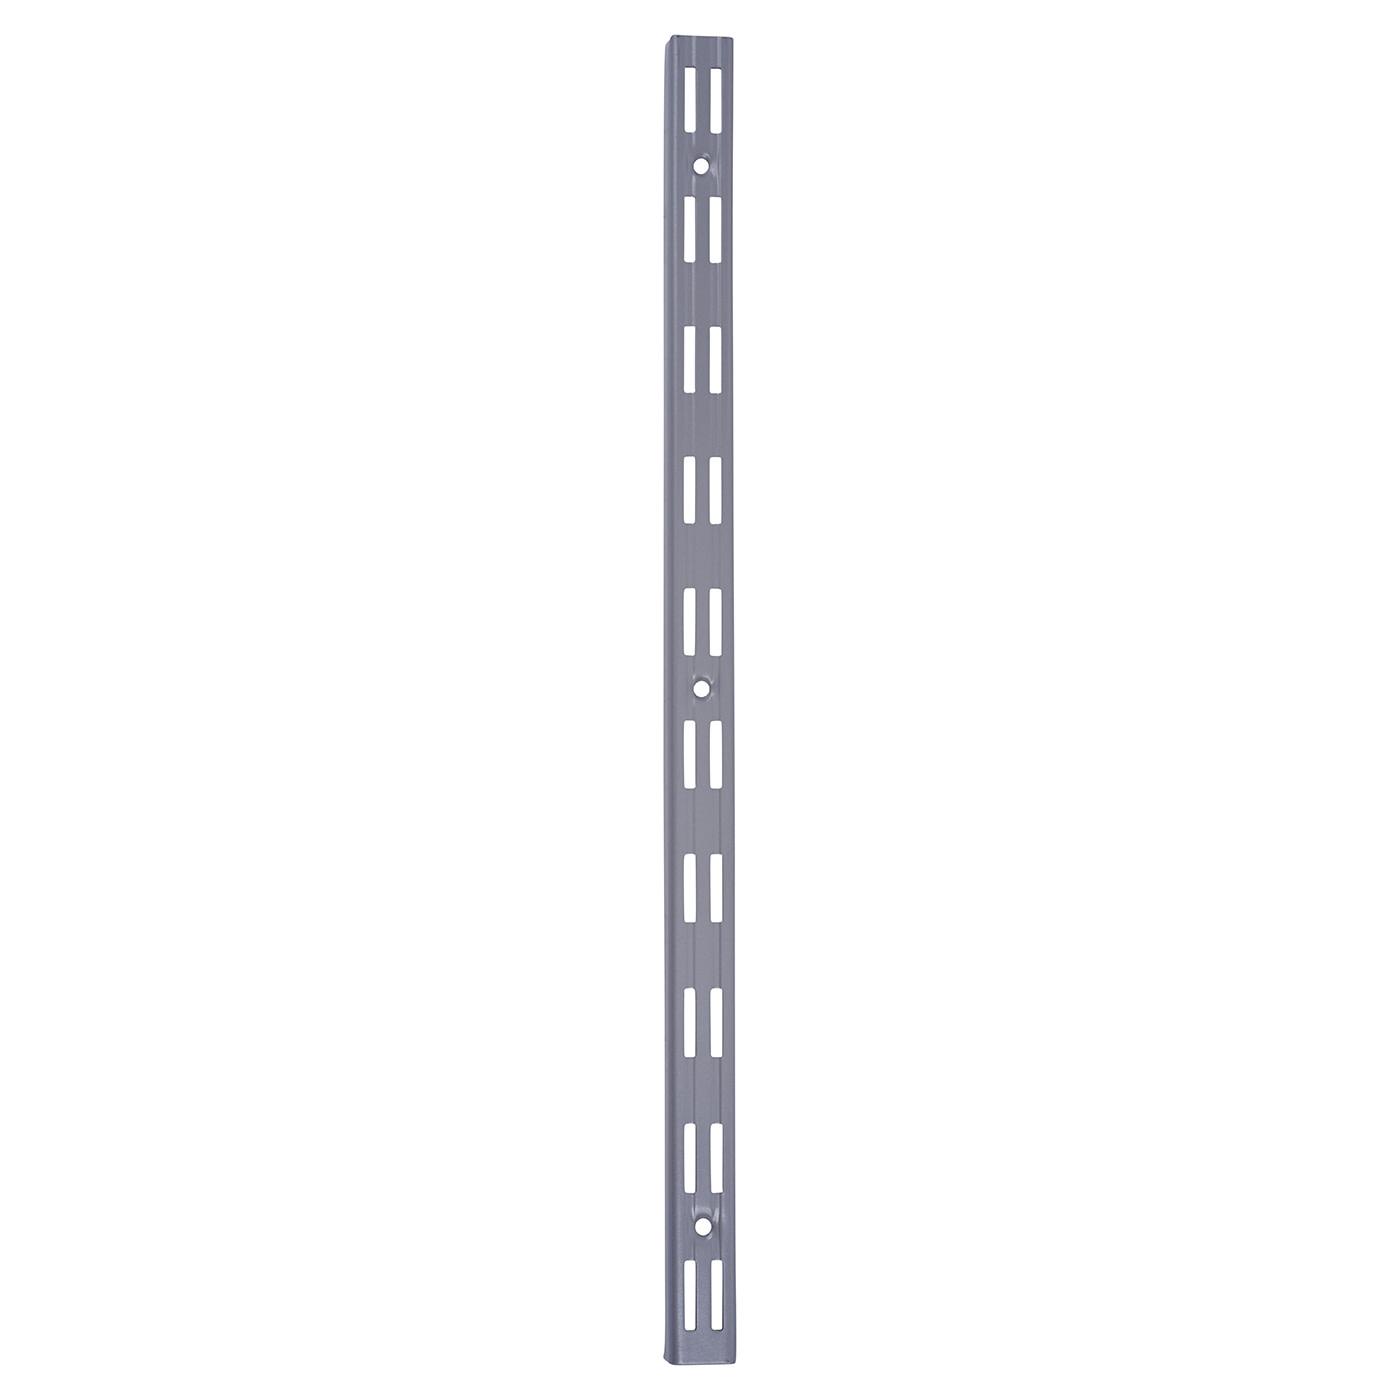 Aspect Twin Slot Upright - 500mm - Silver)